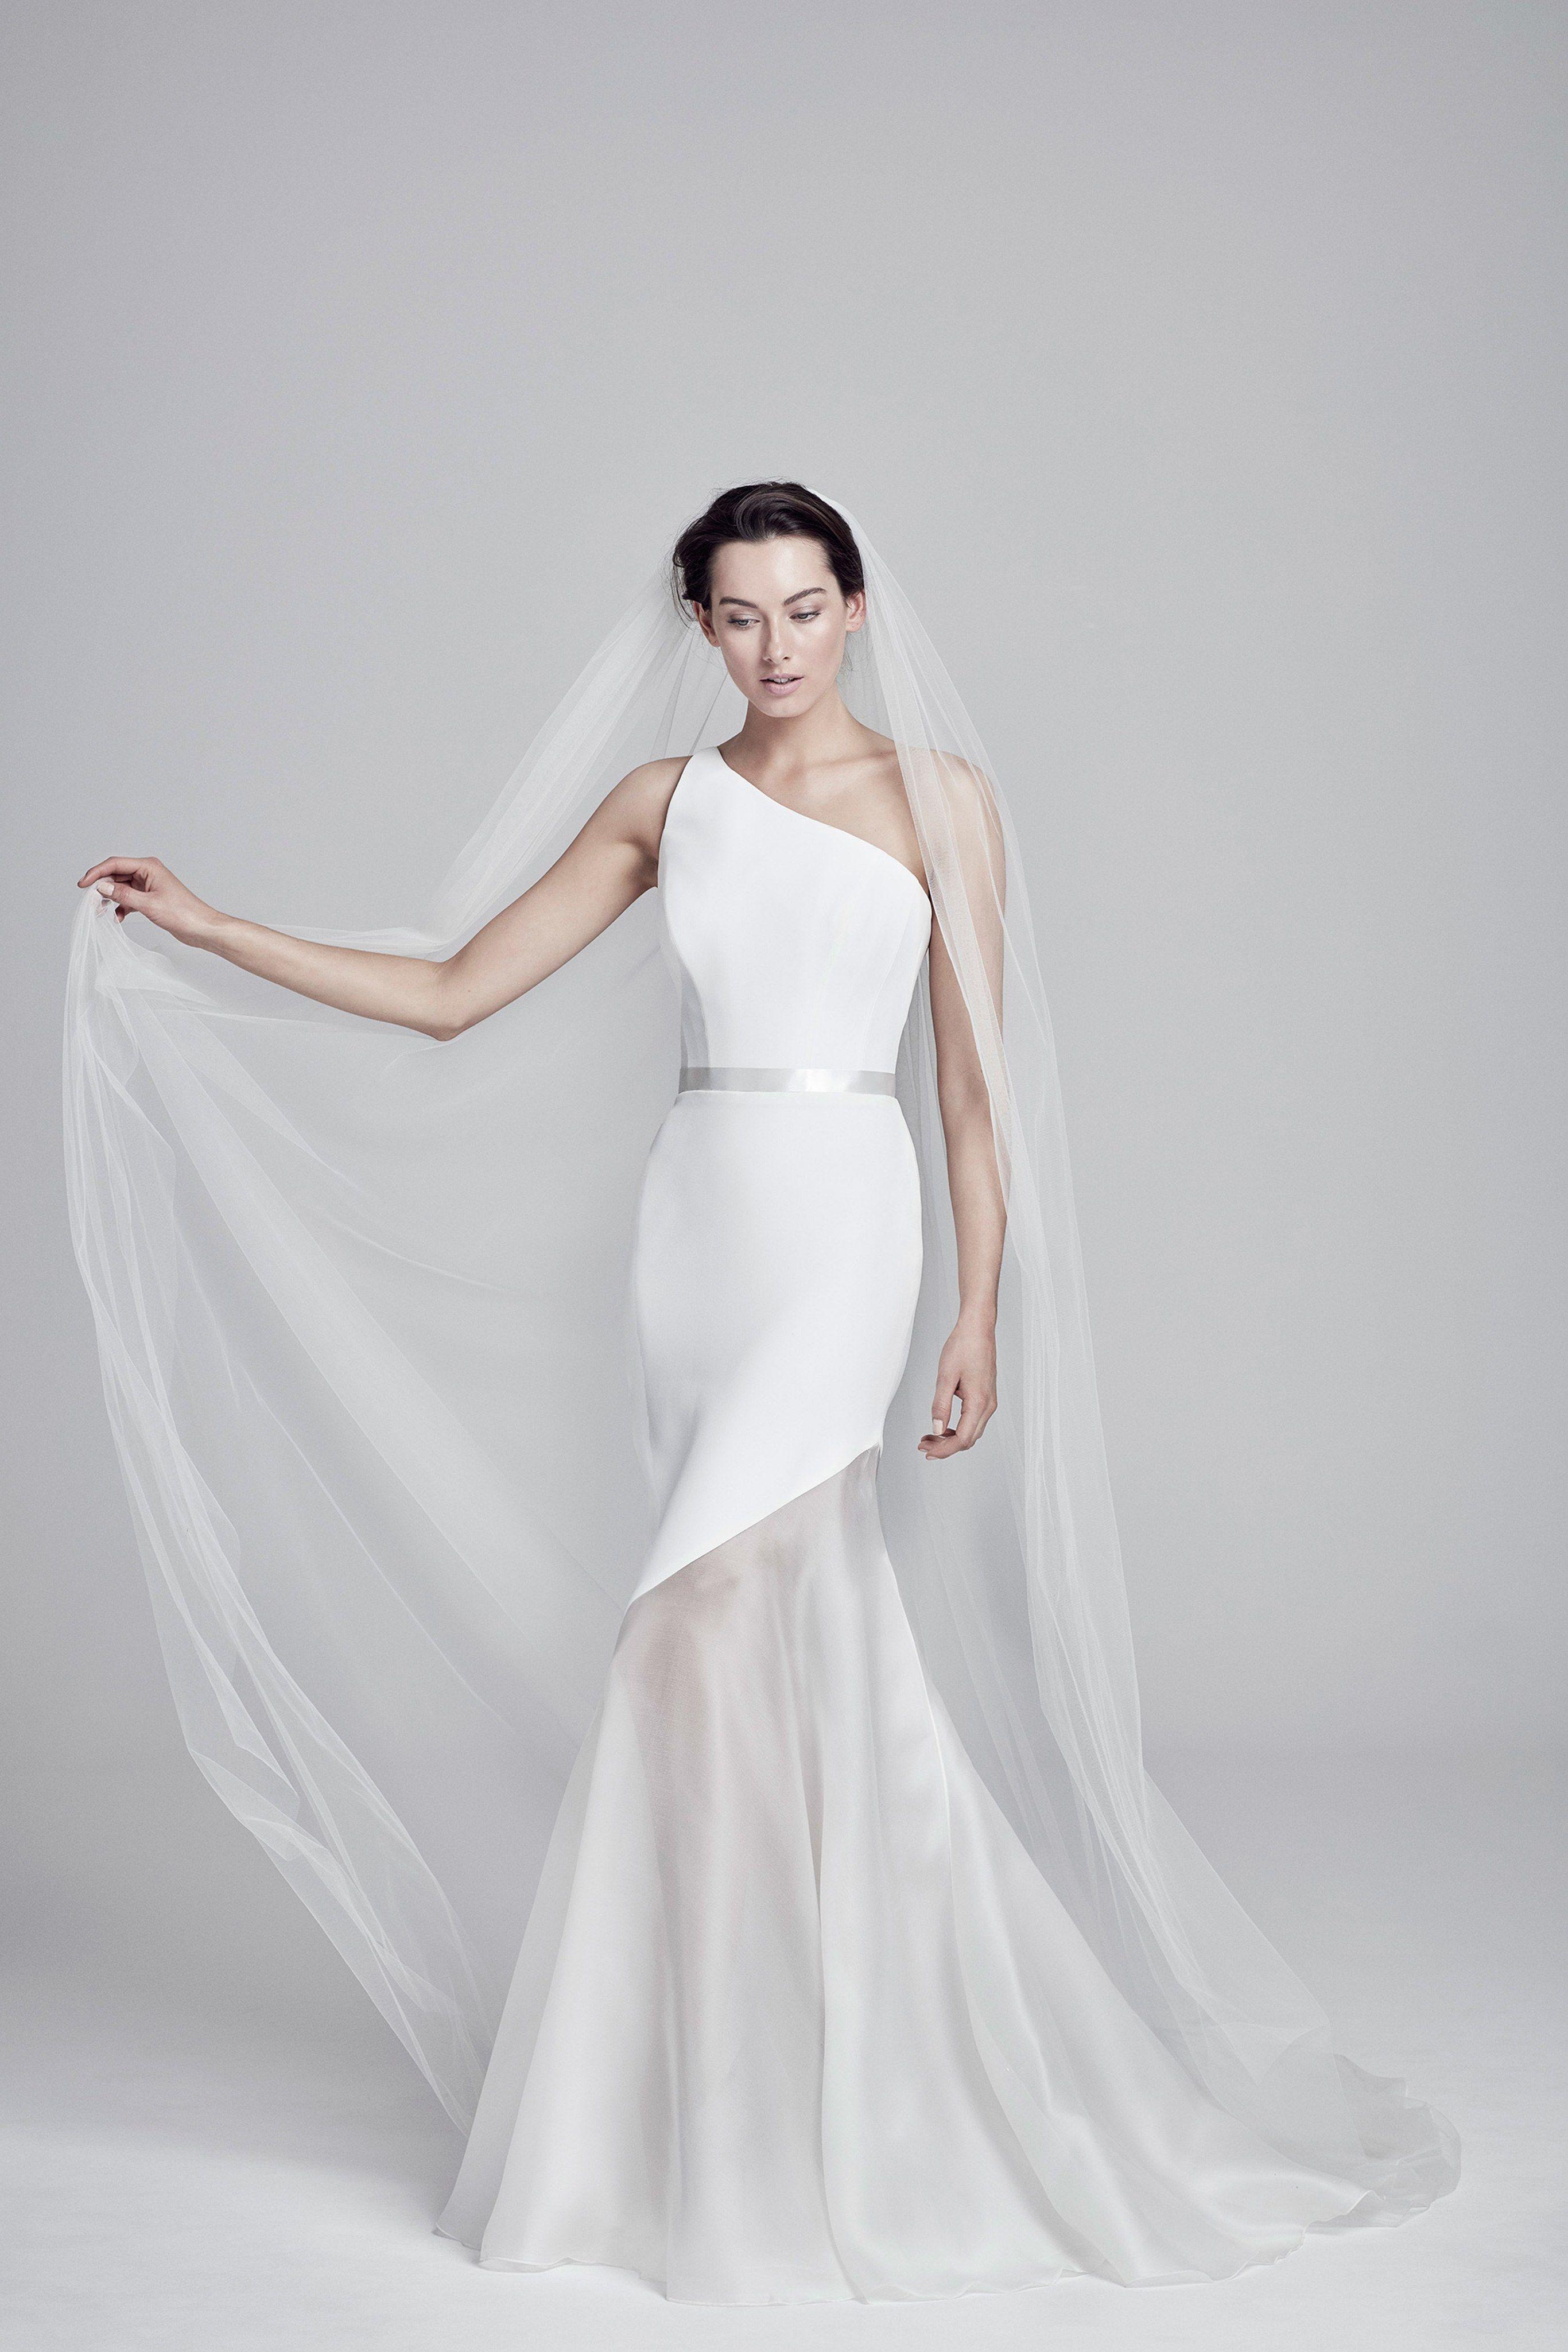 Butterfly By Suzanne Neville Wedding Dress In 2020 Suzanne Neville Wedding Dresses Wedding Dresses Dresses